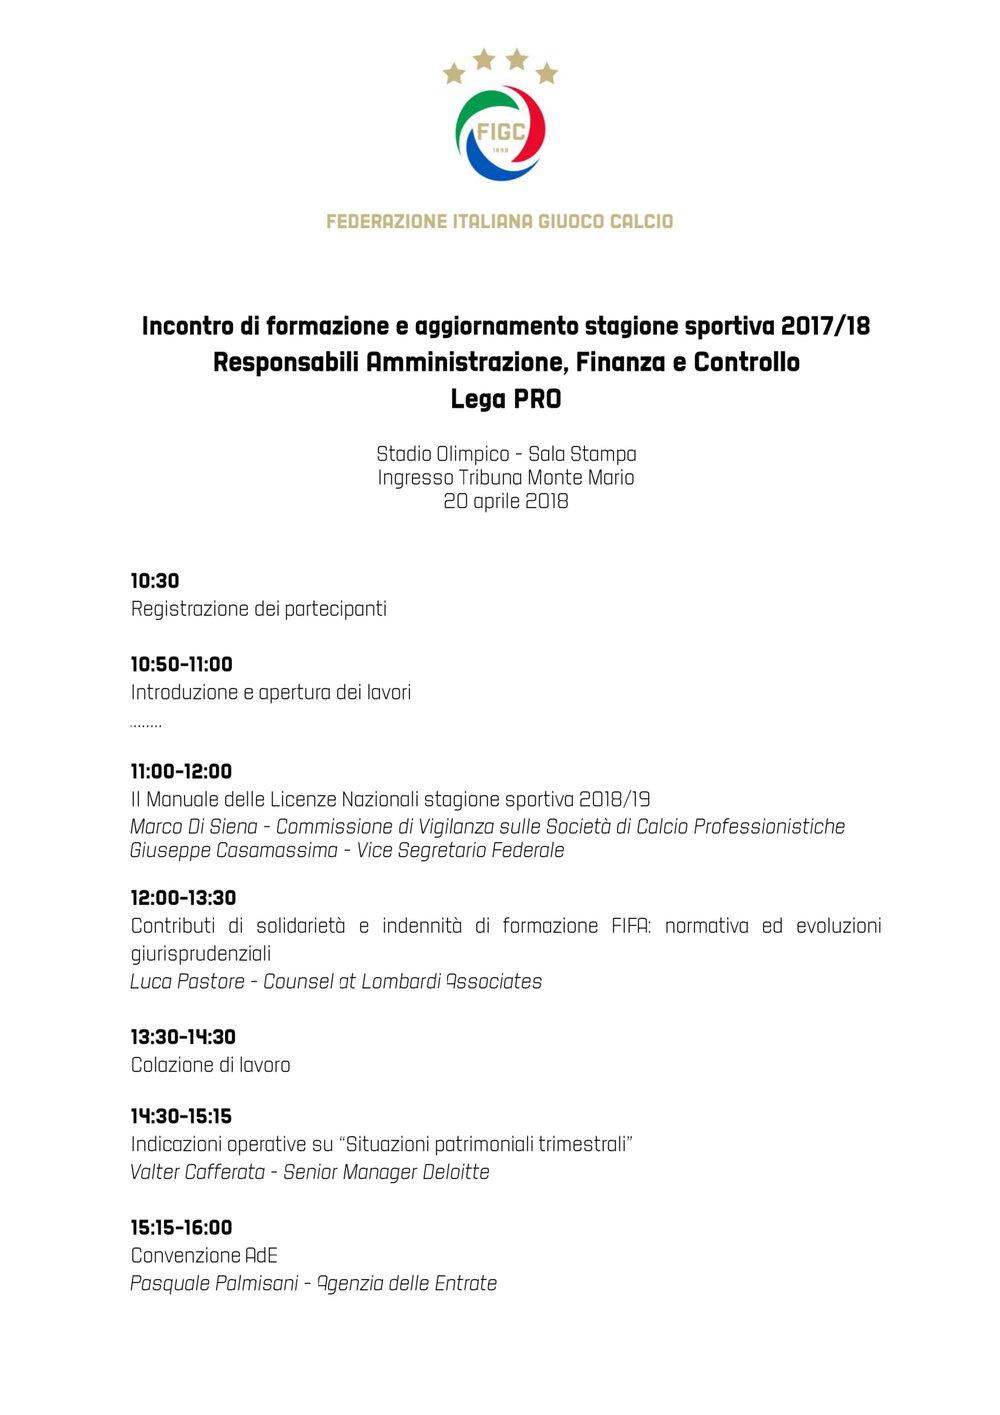 Bozza Programma 20 apr - AFC-1.jpg